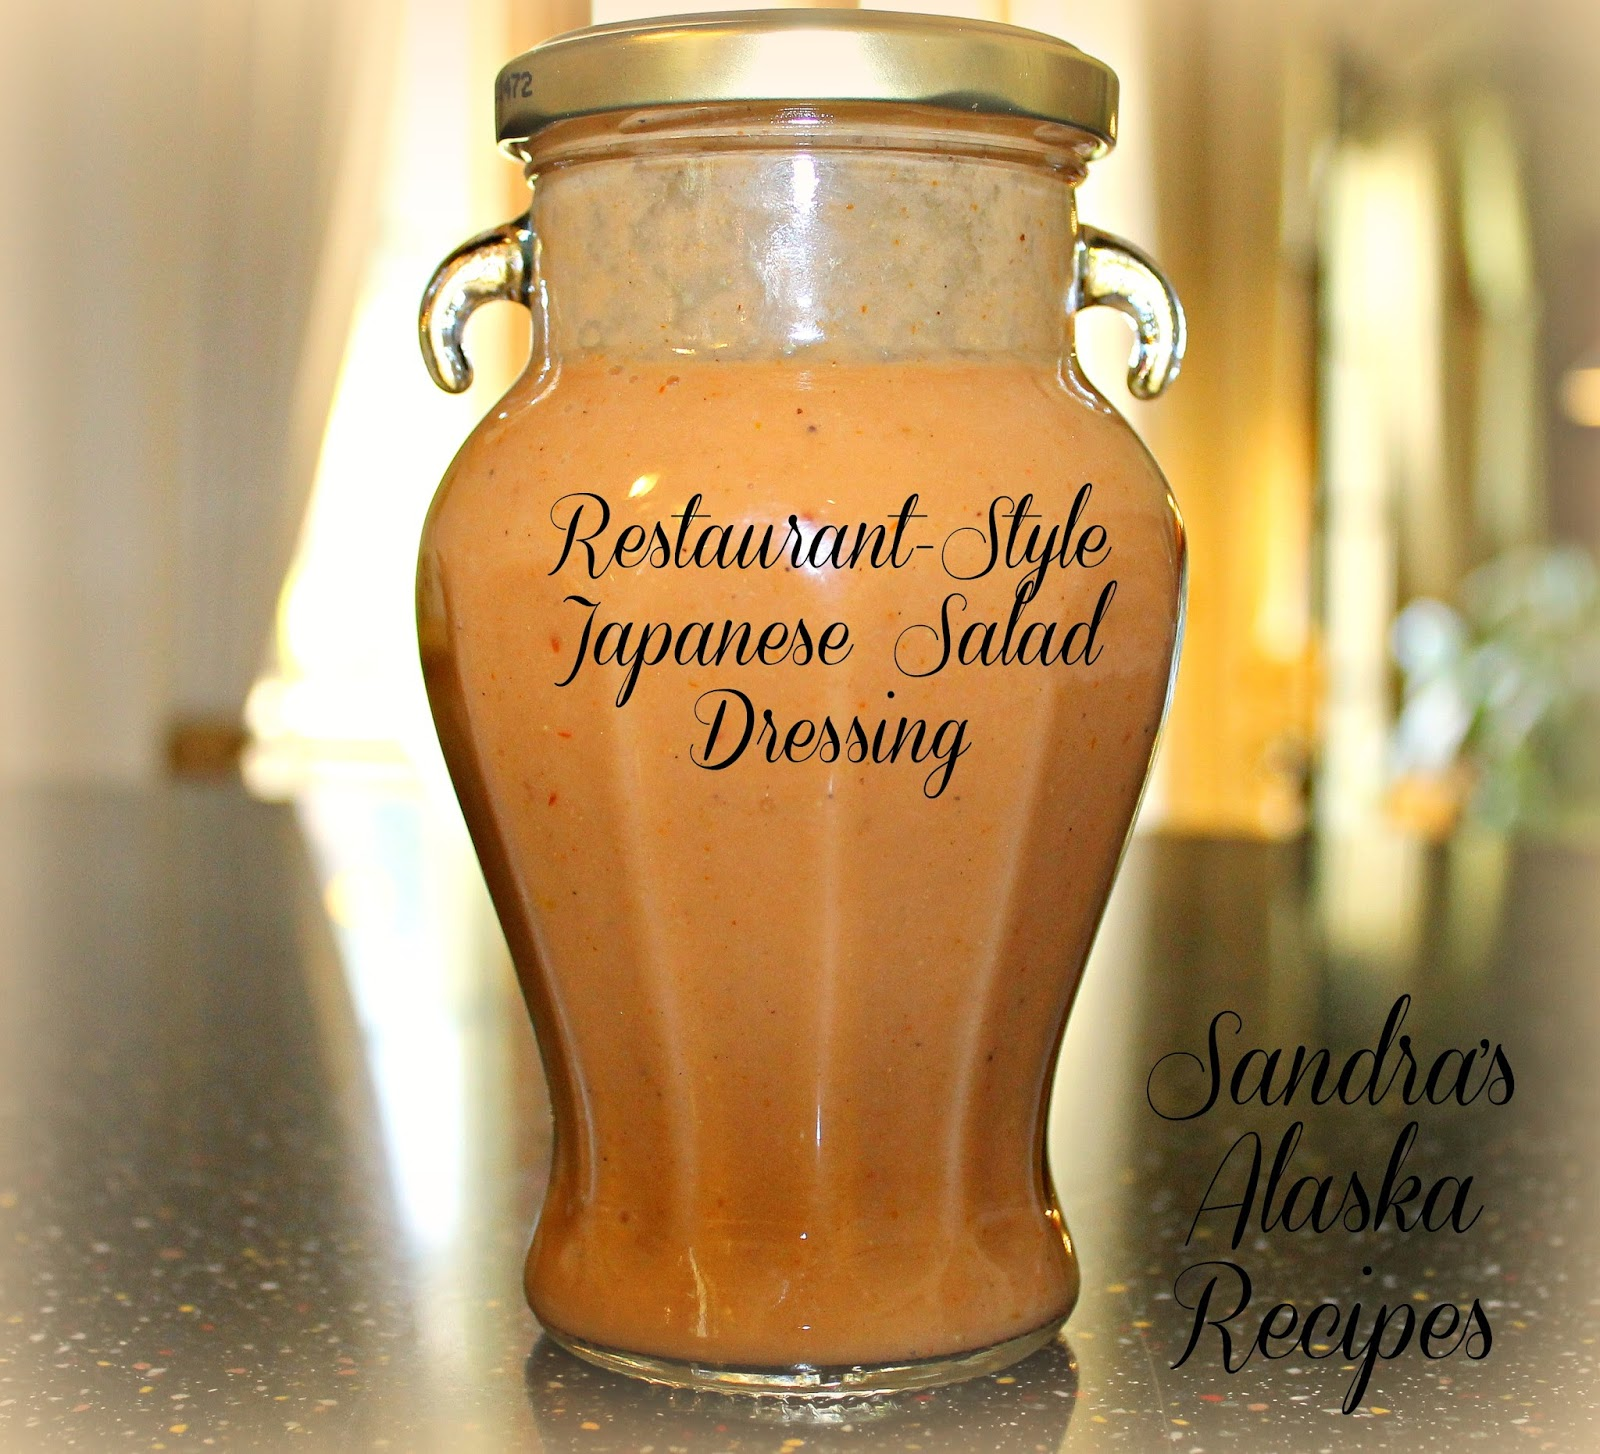 ... Alaska Recipes: SANDRA'S JAPANESE RESTAURANT-STYLE SALAD and DRESSING